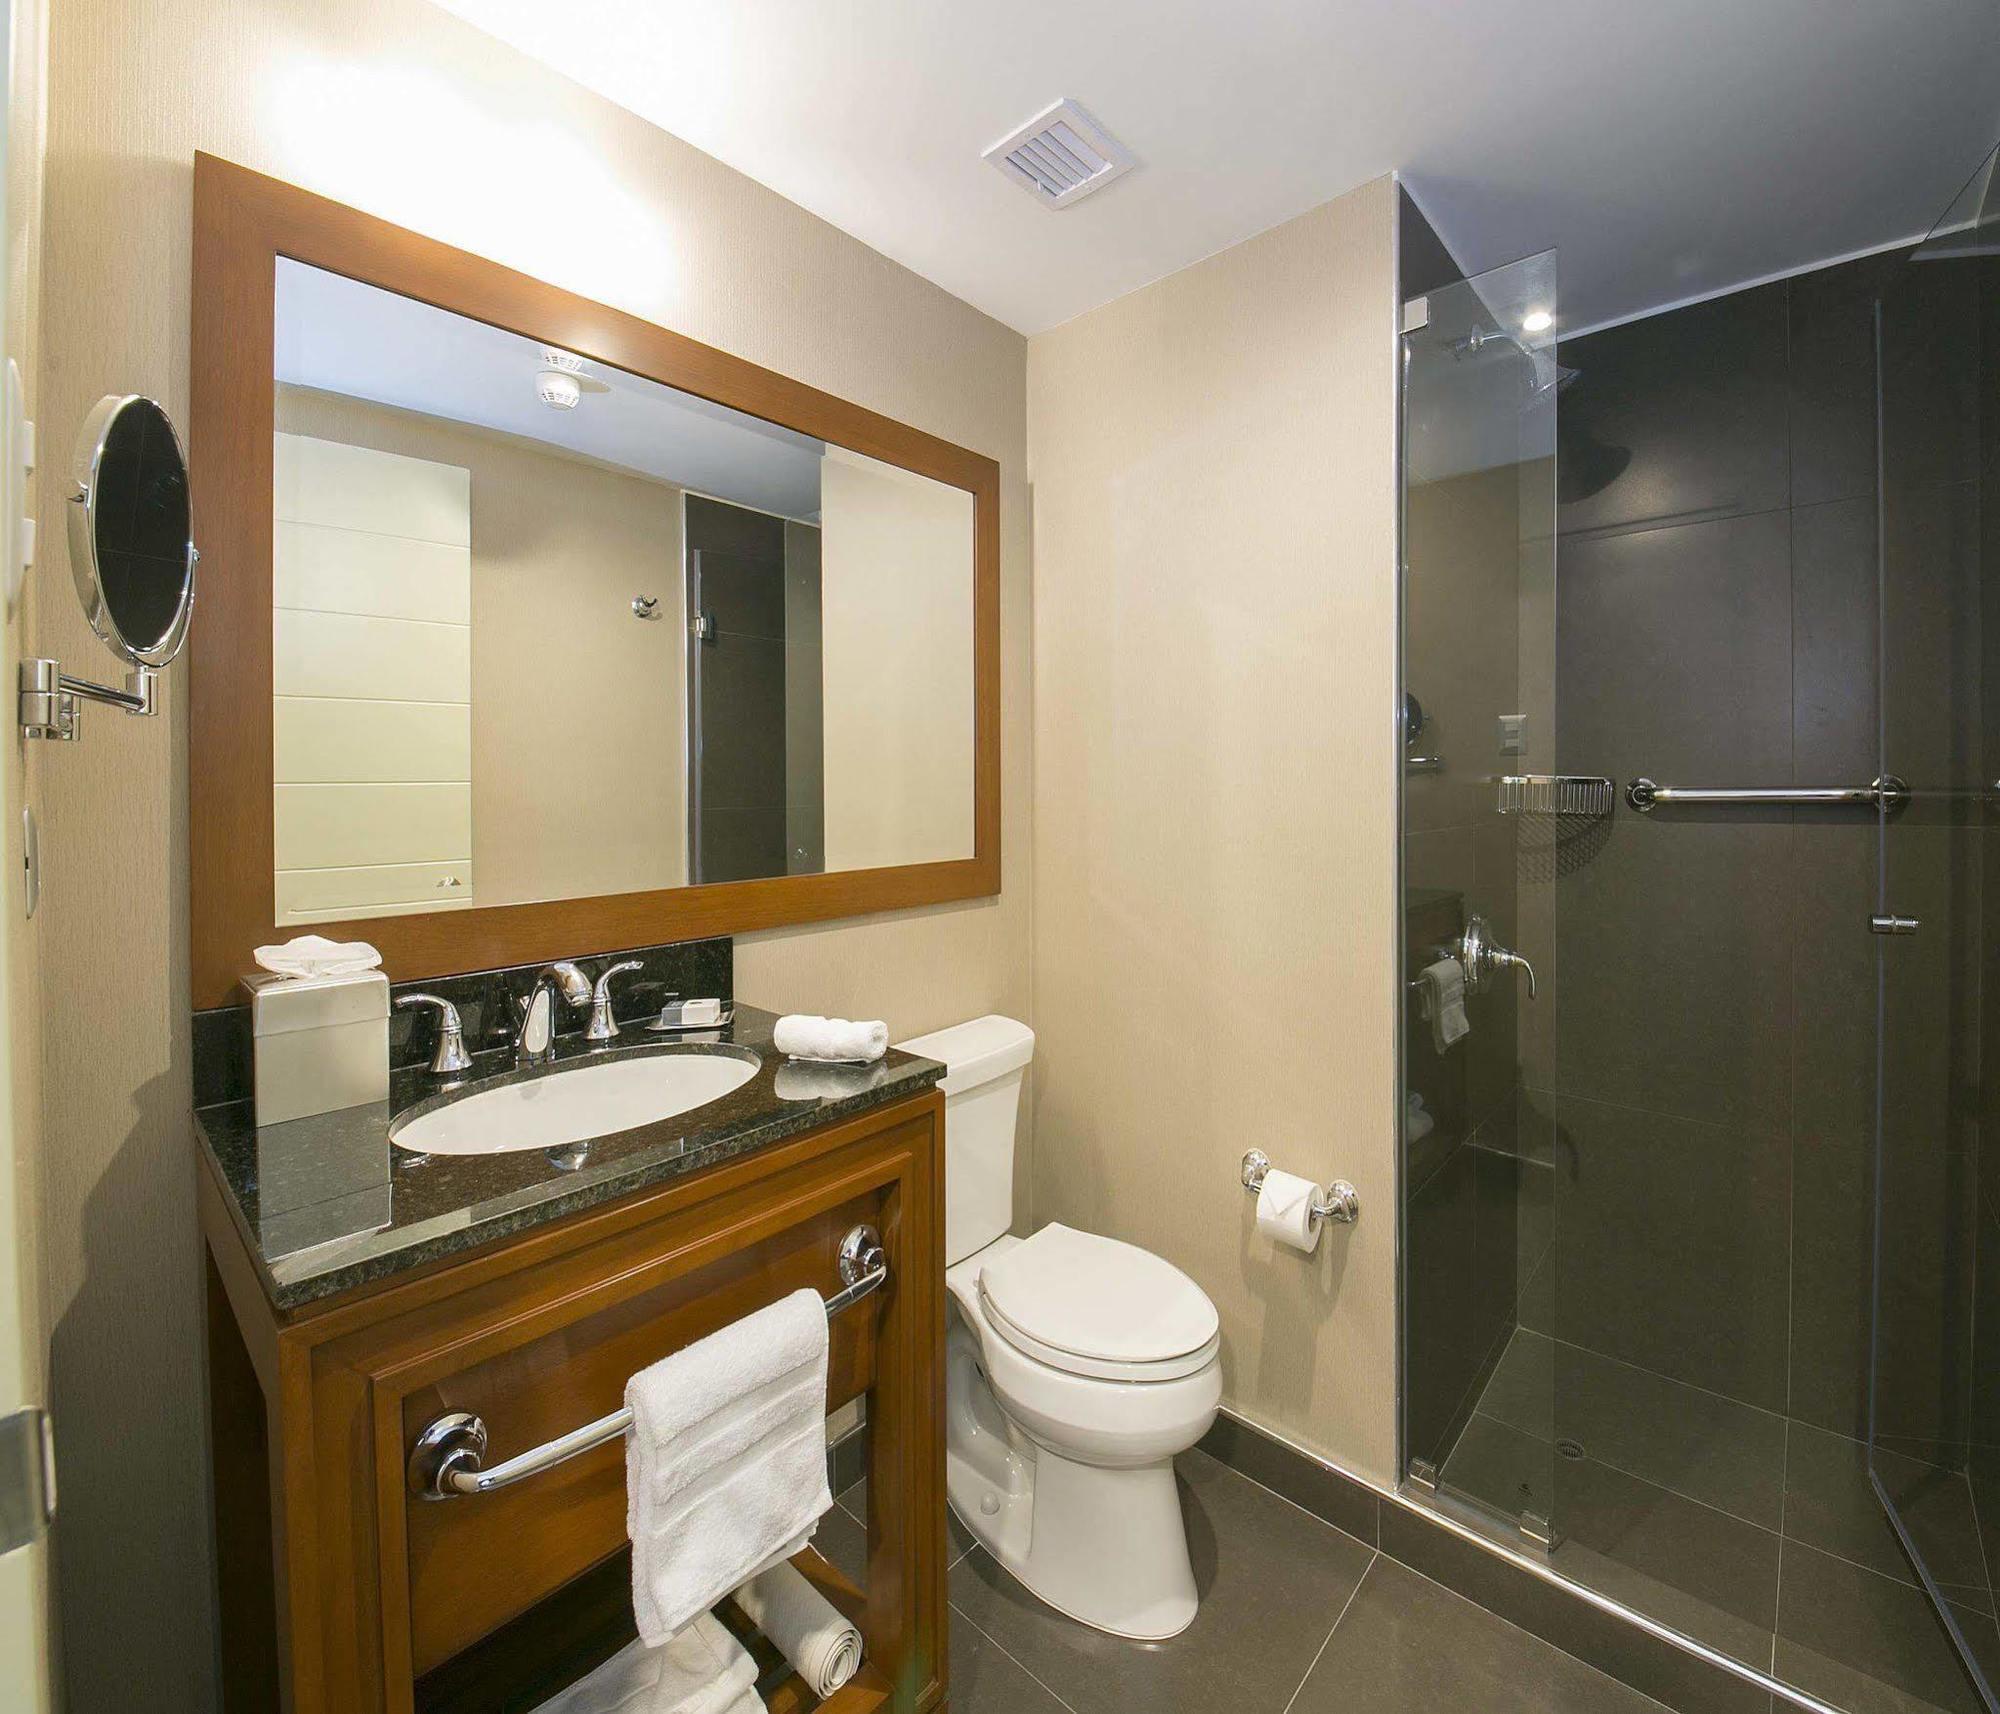 Kathmandu airport bathroom hookups